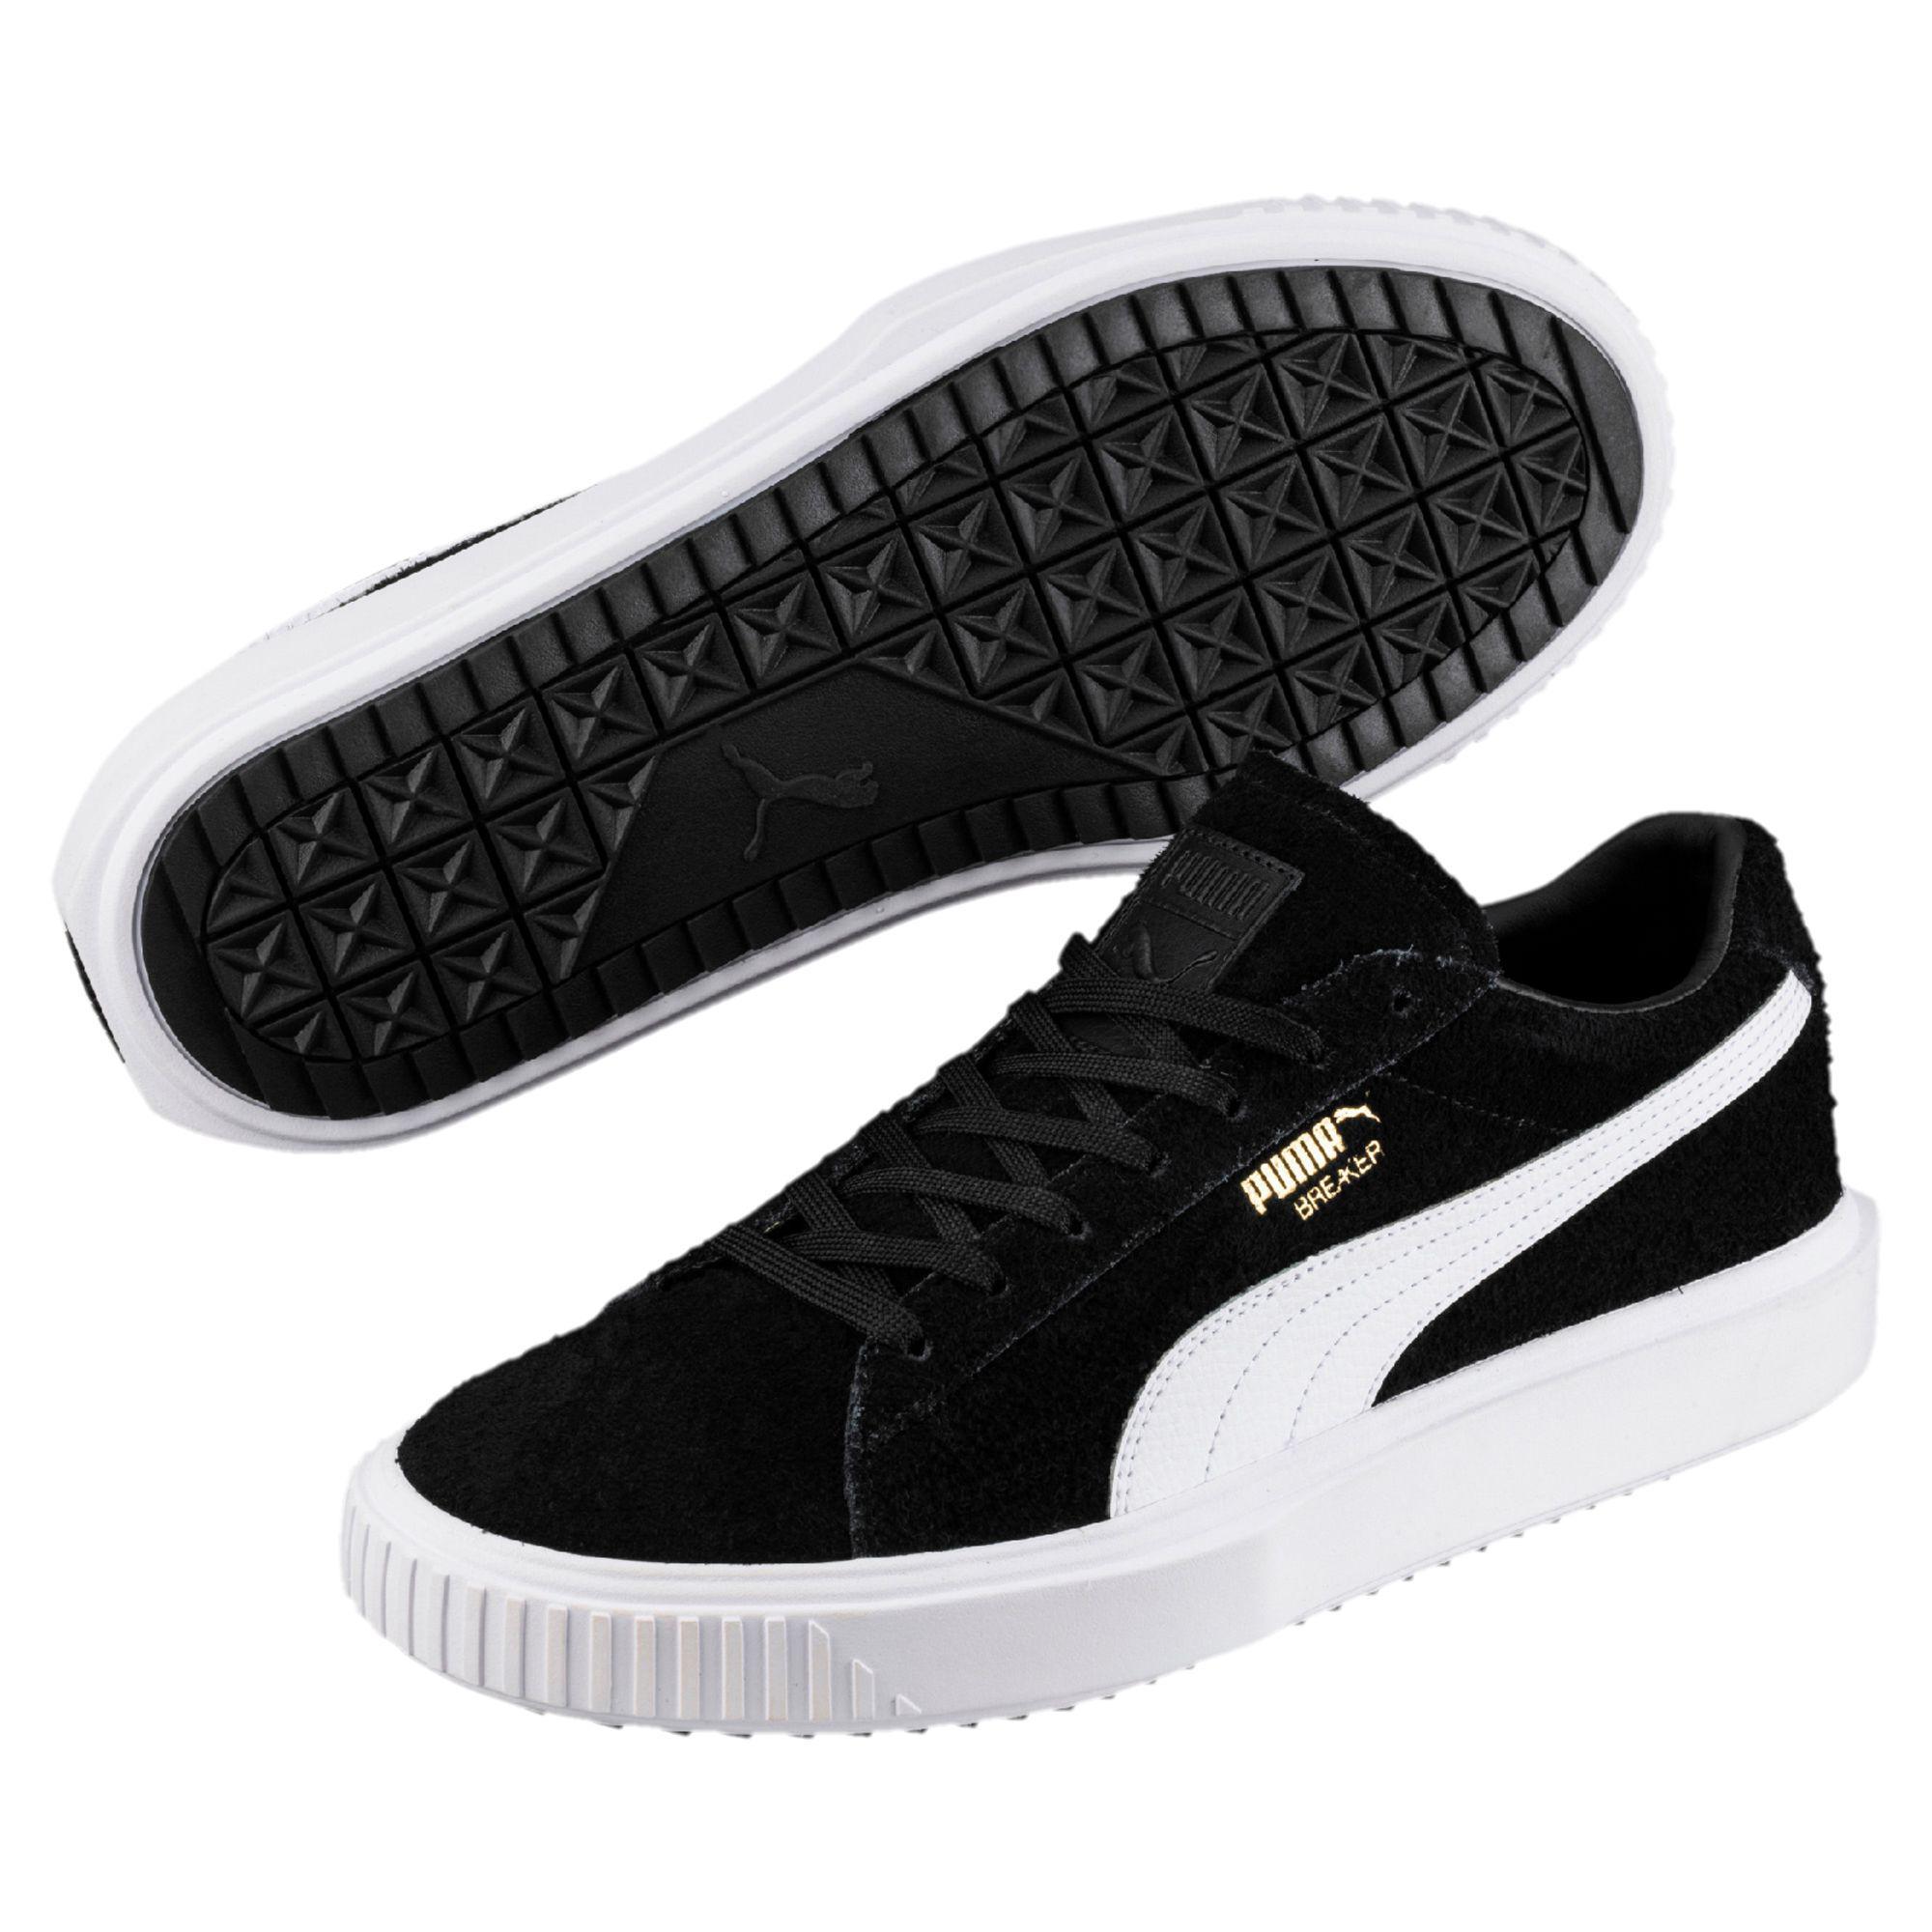 Puma Evolution Black For In Lyst Men Sneakers Breaker zqax1R4wp